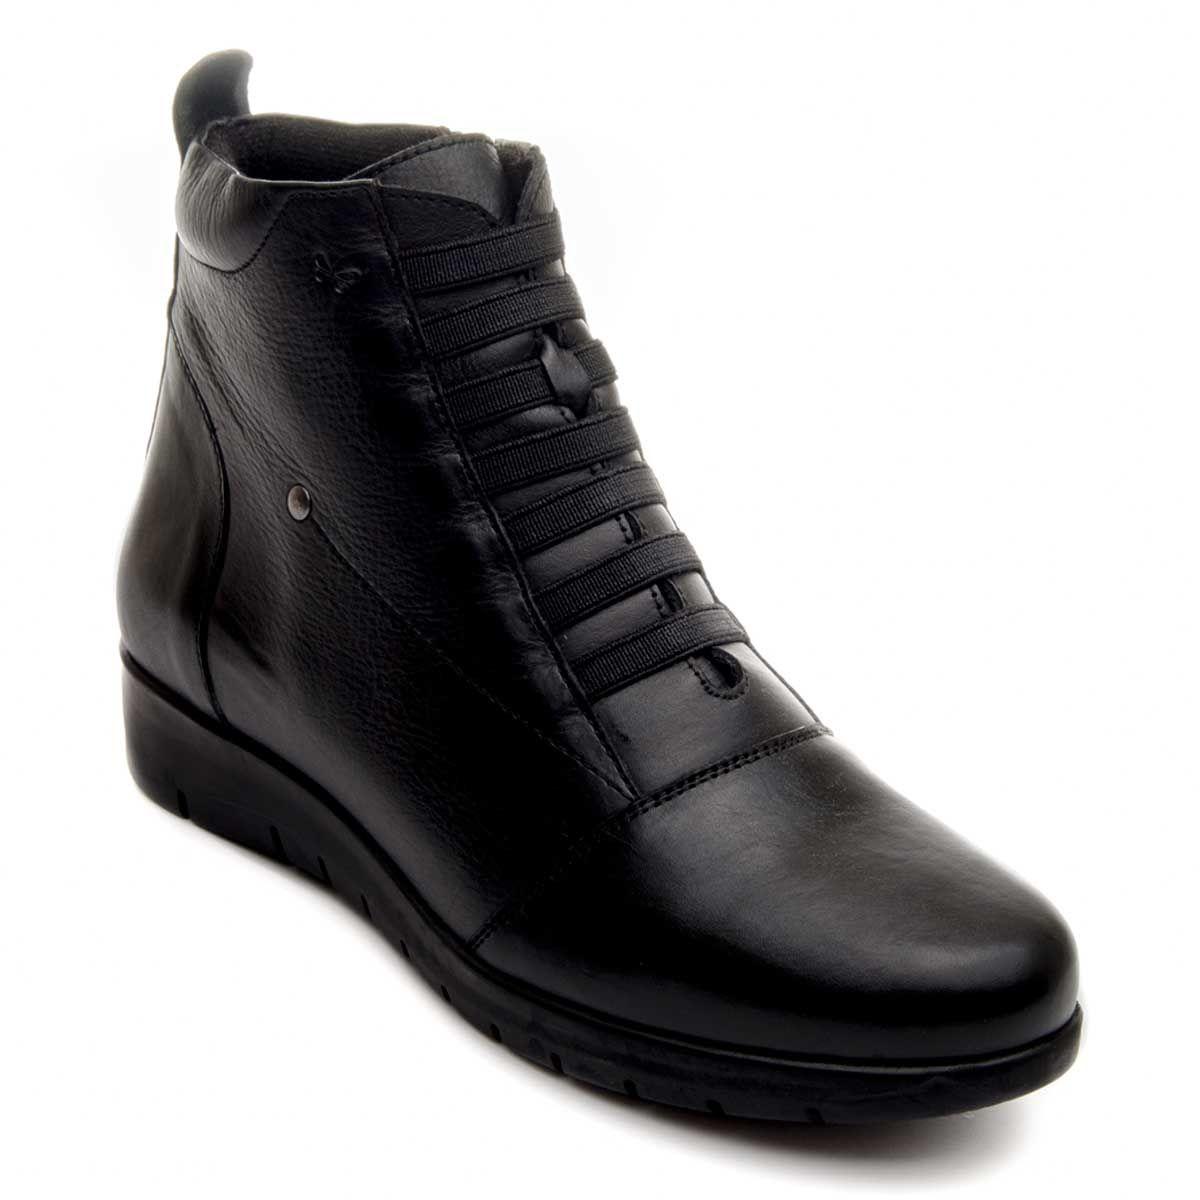 Purapiel Wedge Ankle Boot in Black